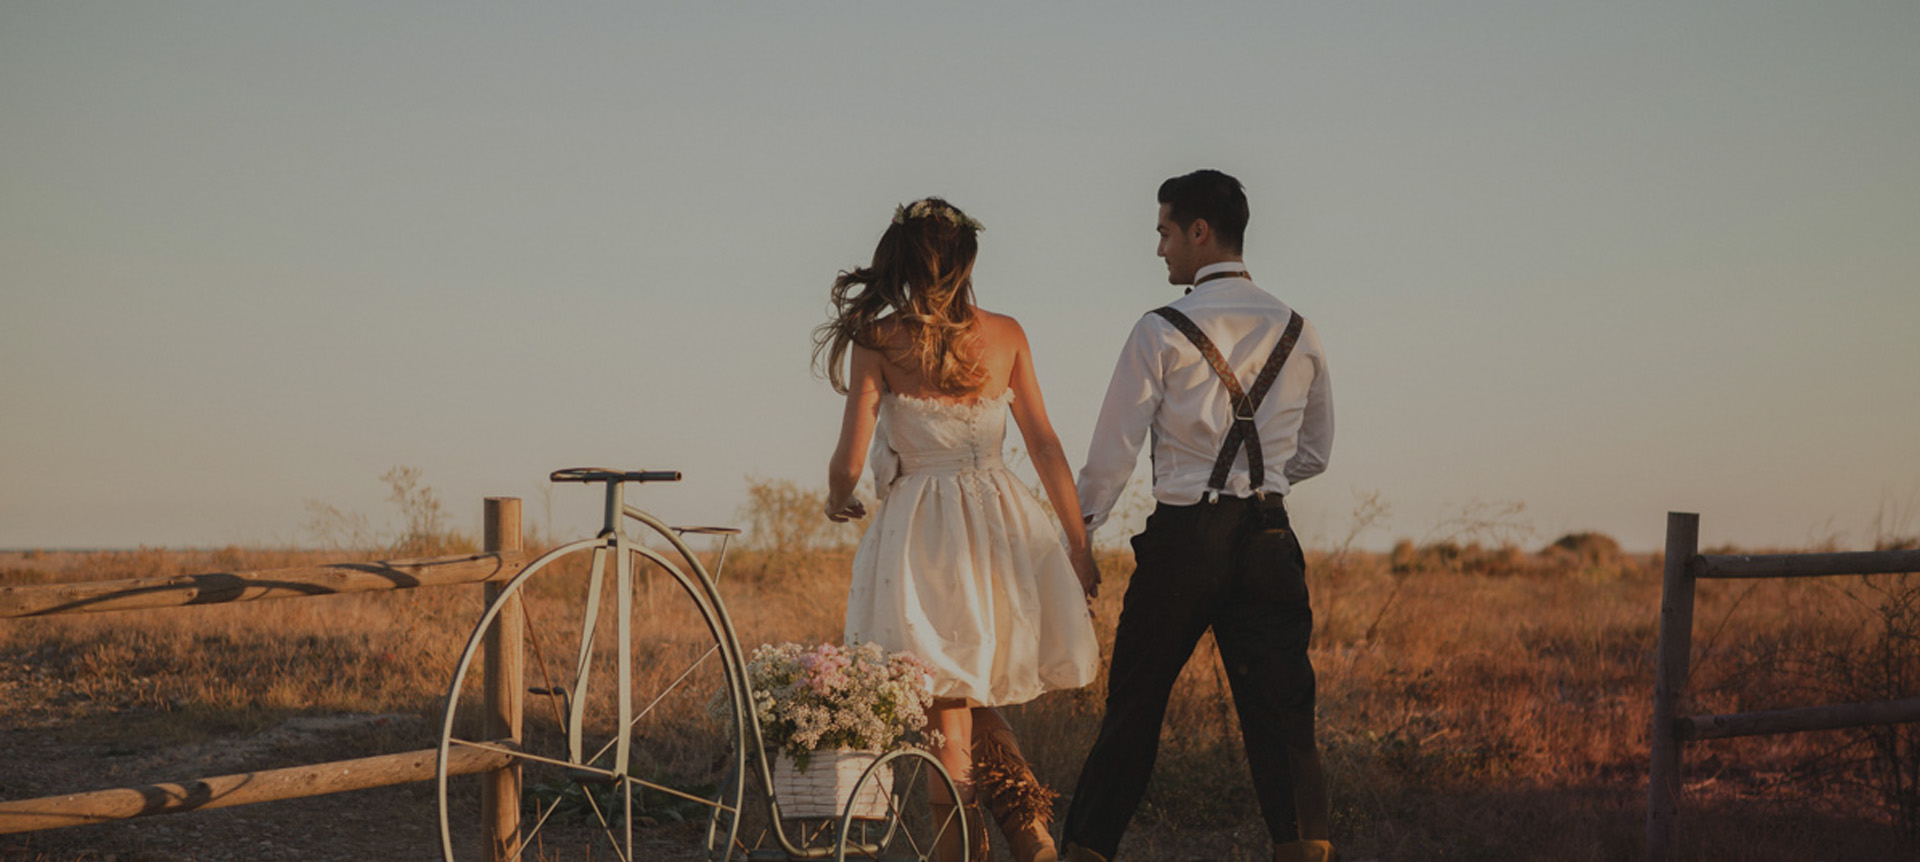 Love storytellers